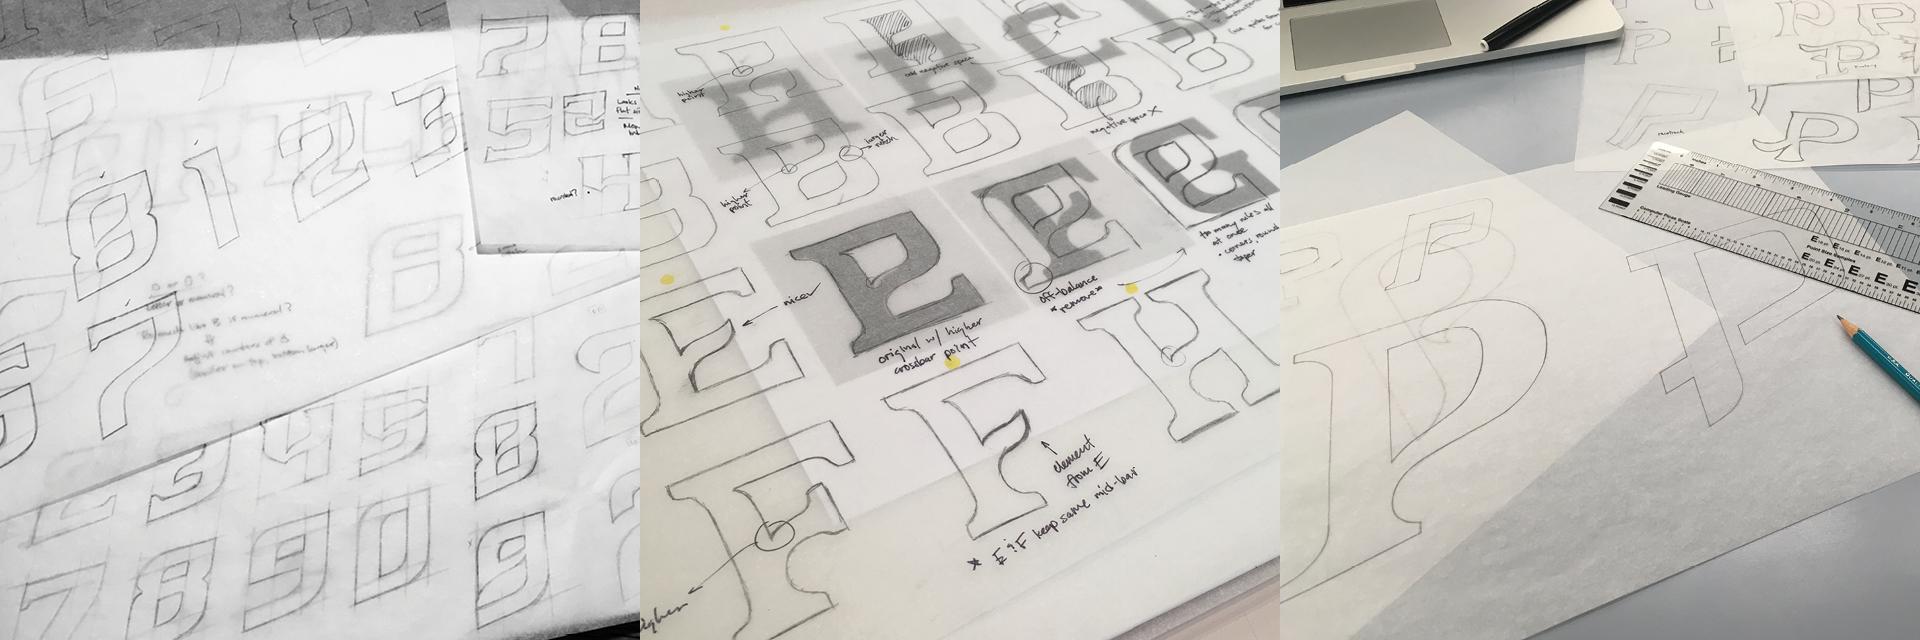 8 Type Sketches.jpg